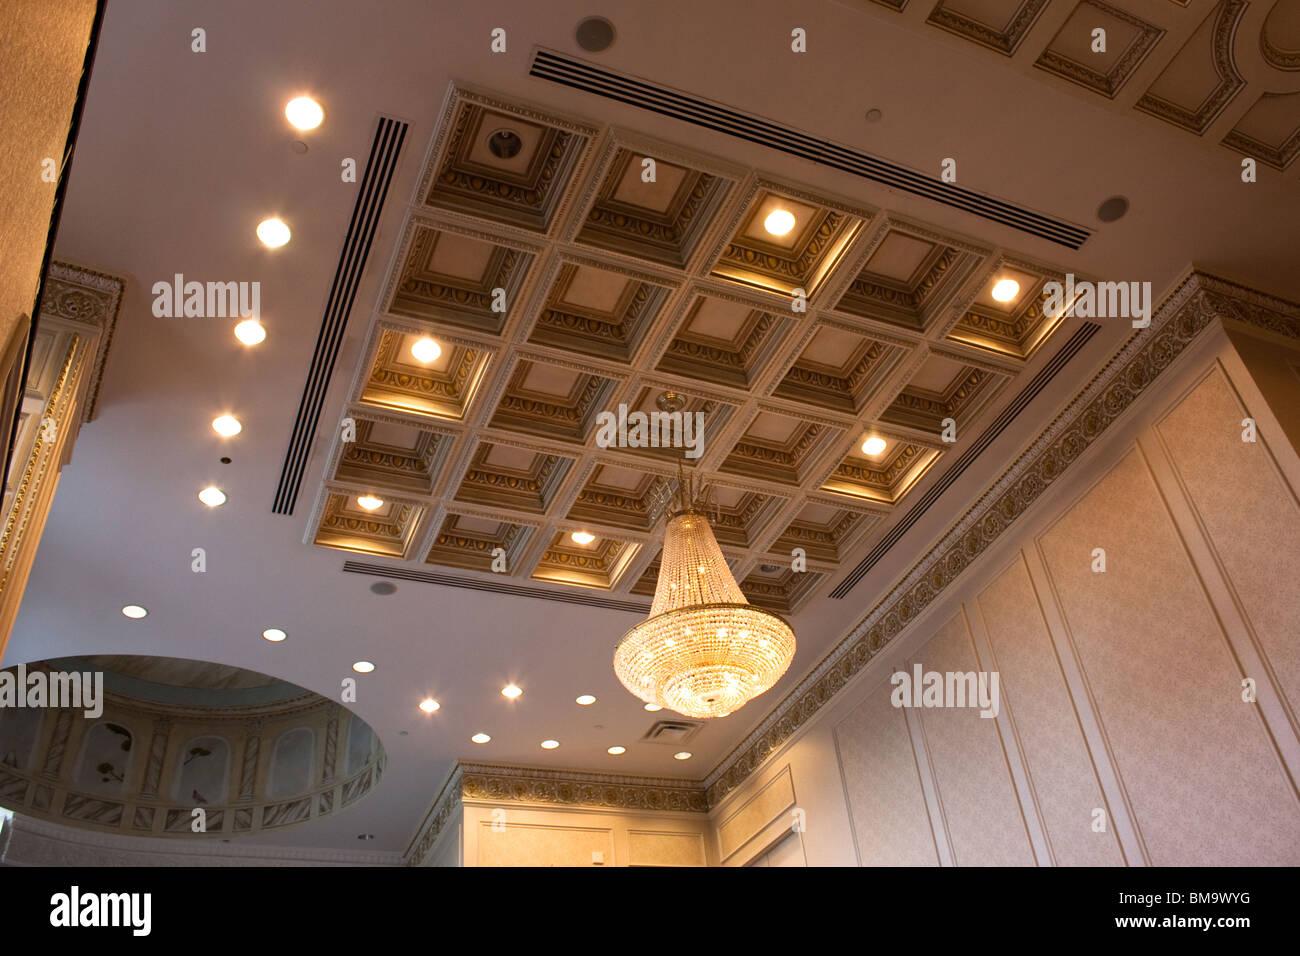 Stock Photo   Ceiling Banquet Hall Lighting Fixtures